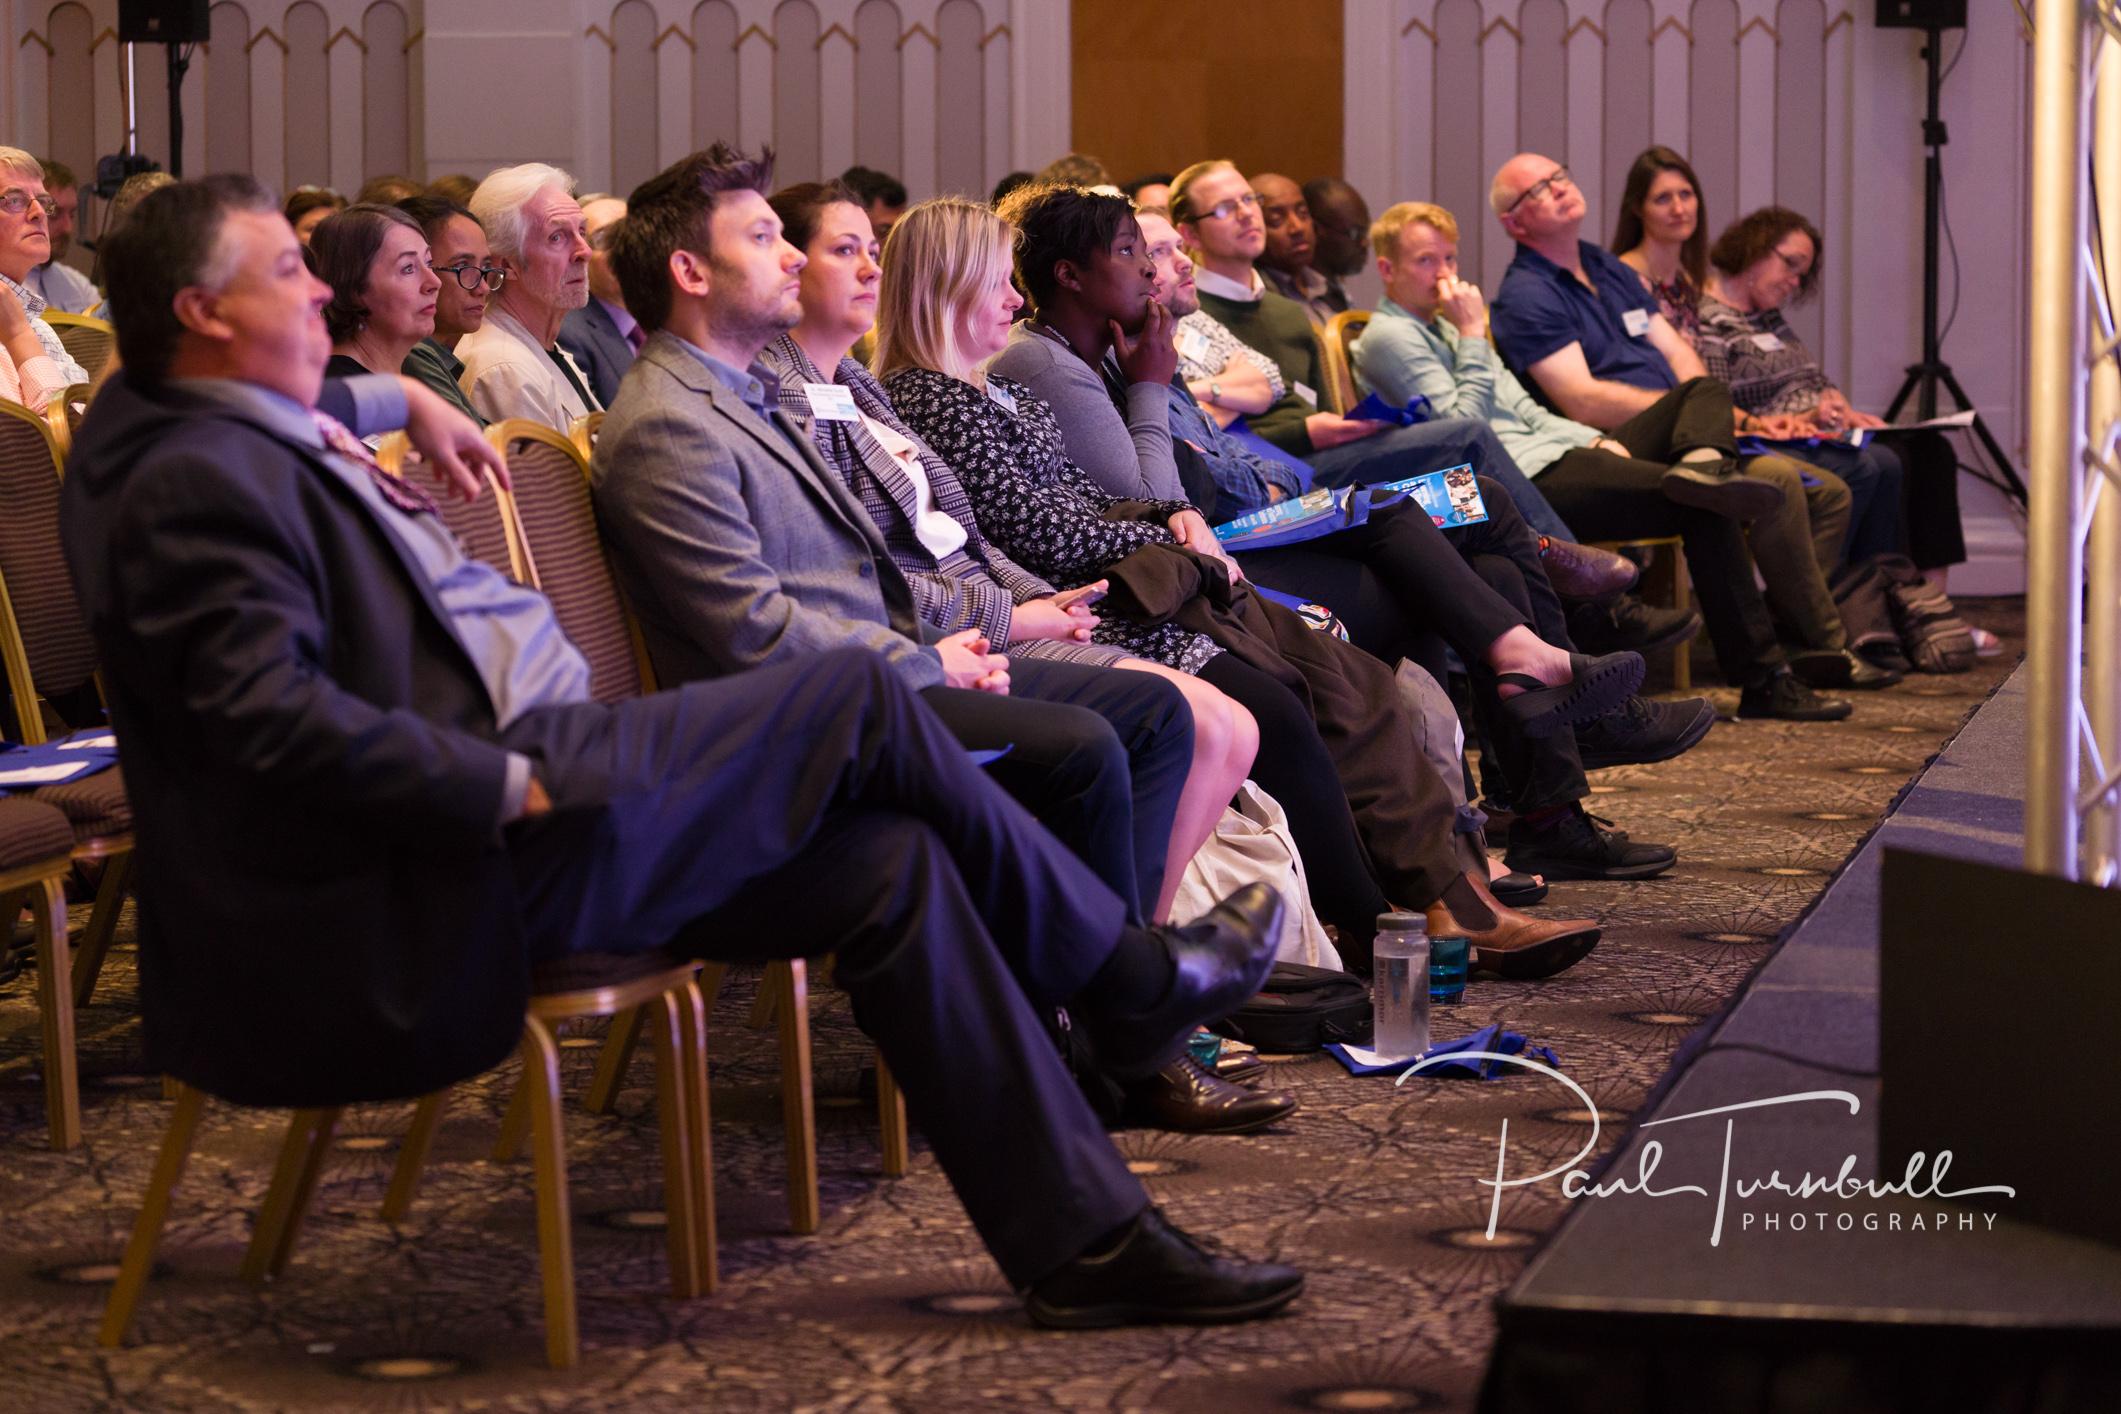 conference-event-photographer-queens-hotel-leeds-yorkshire-041.jpg